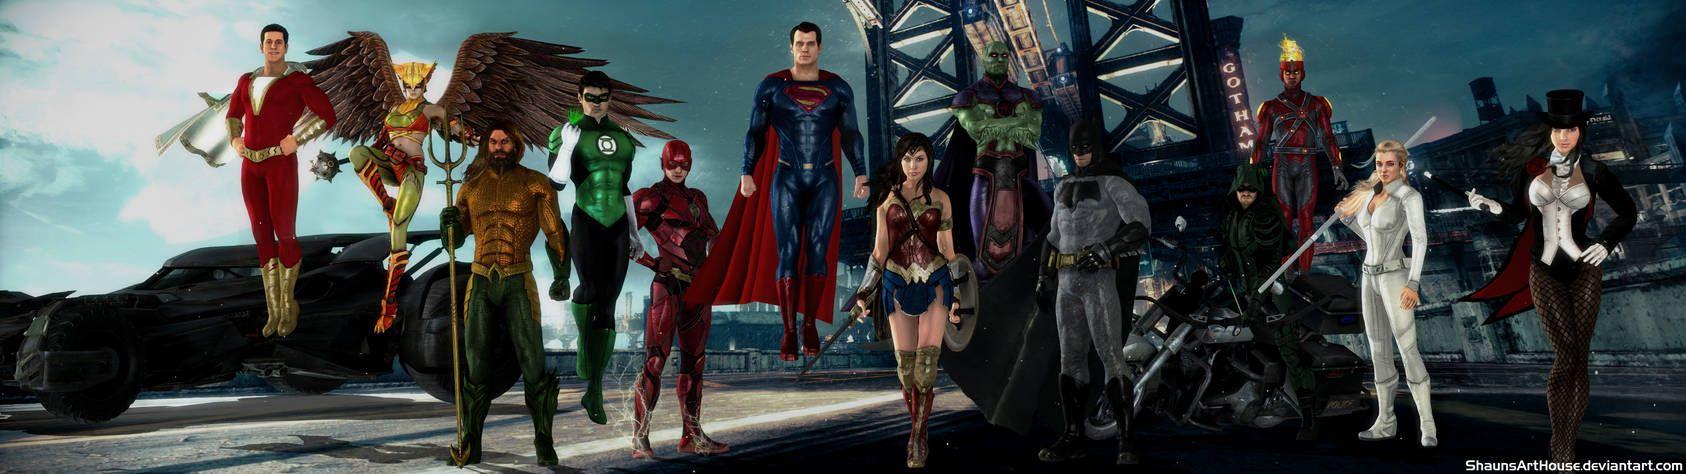 Justice League Dceu Cw Dual Screen Wallpaper By Https Www